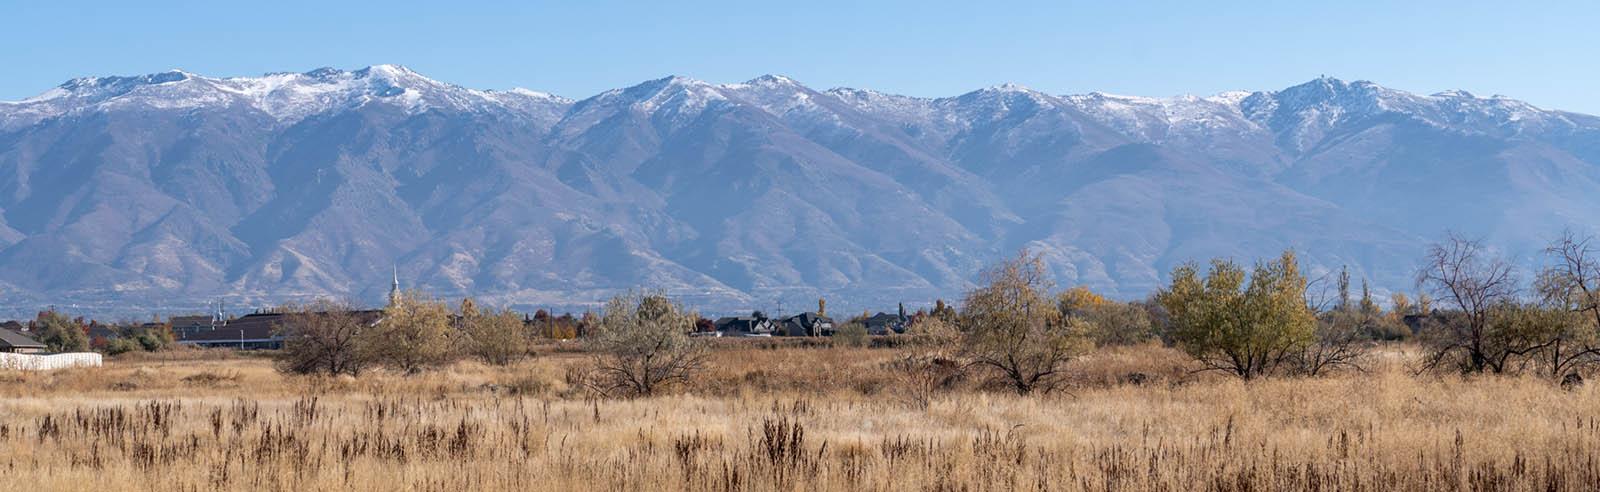 Rural Countryside in West Davis